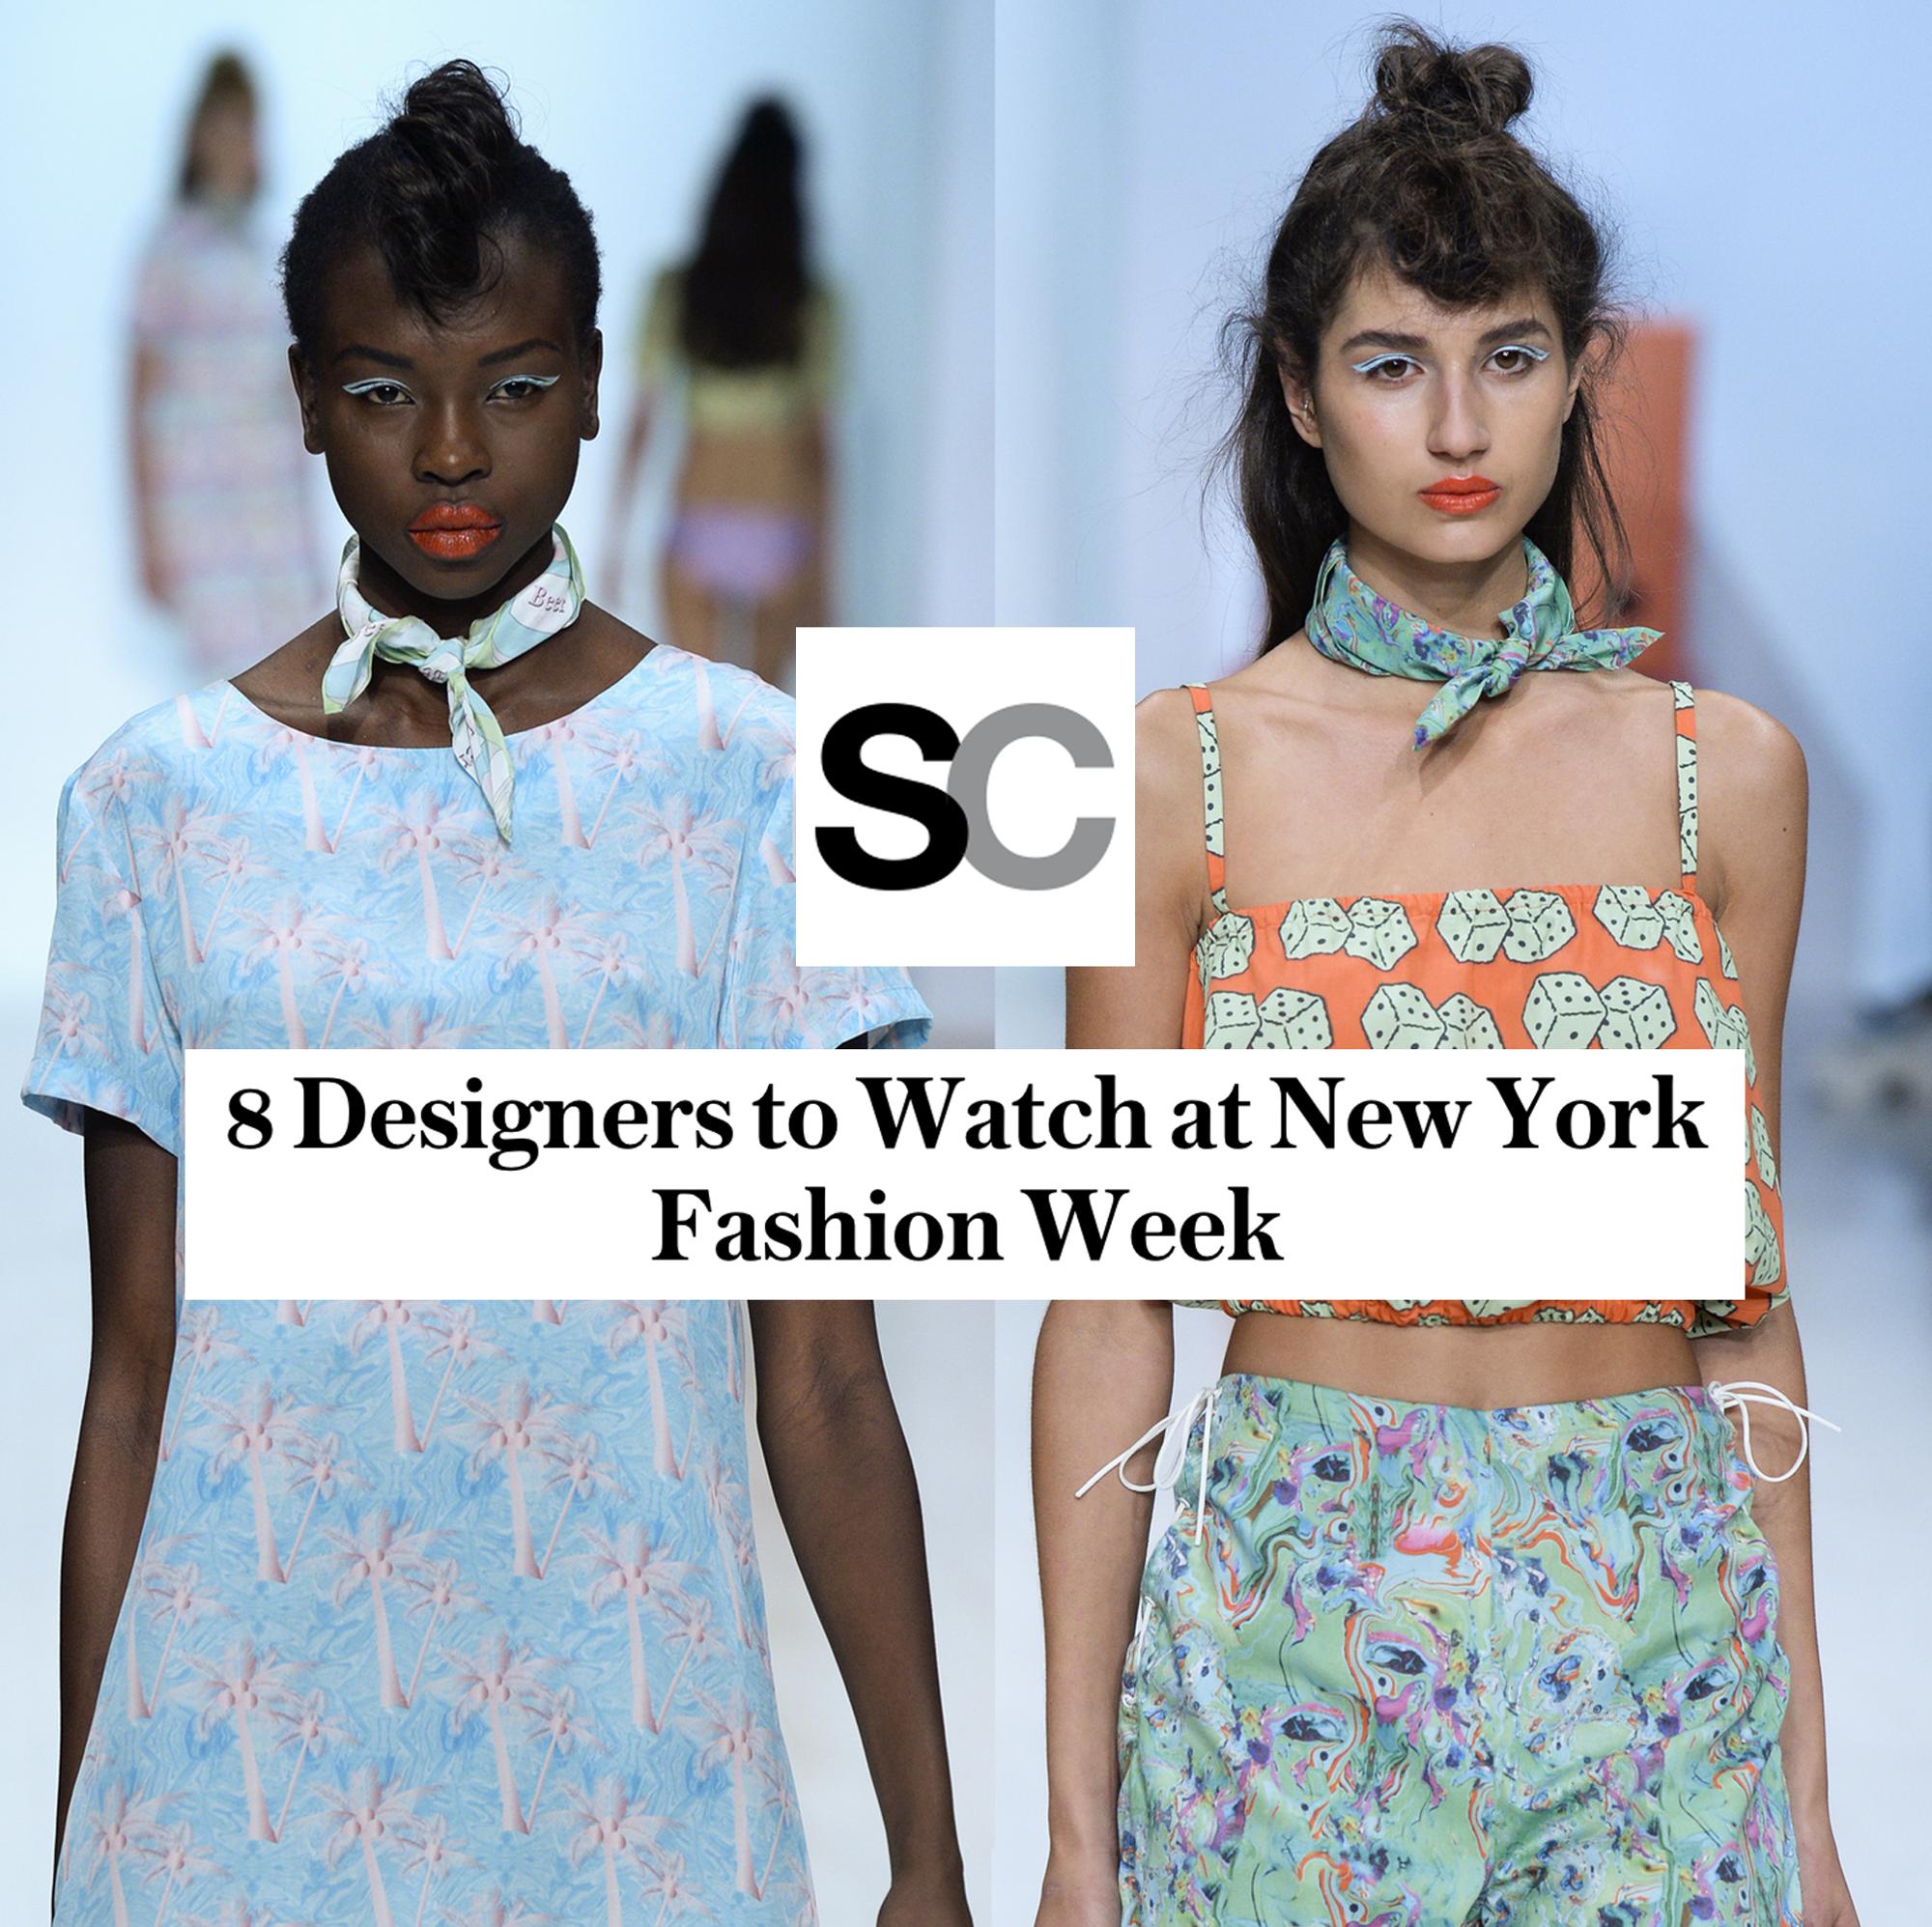 https://stylecaster.com/new-designers-nyfw-fall-2017/